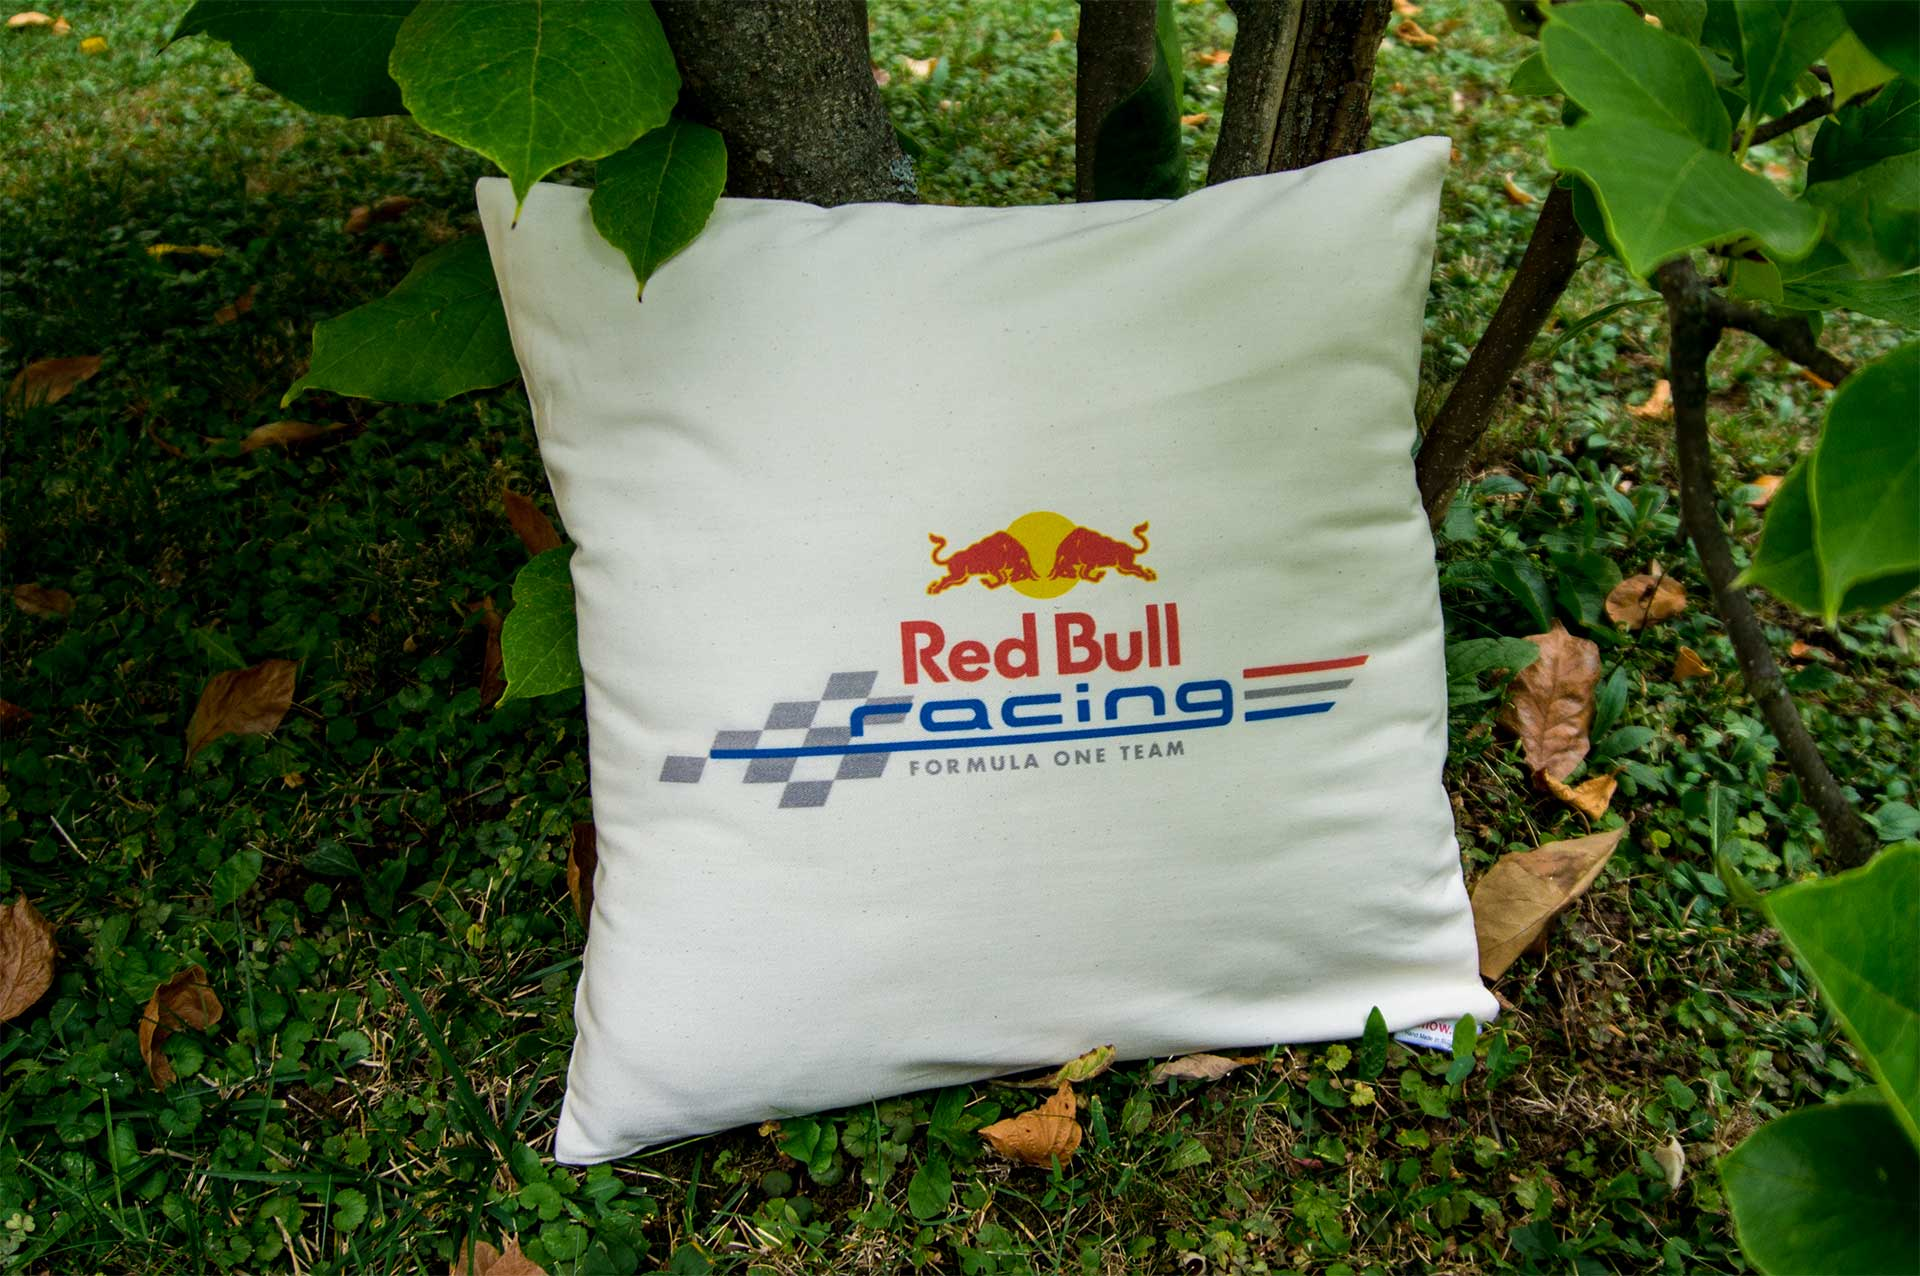 Bavlnený vankúš s logom Red Bull Racing